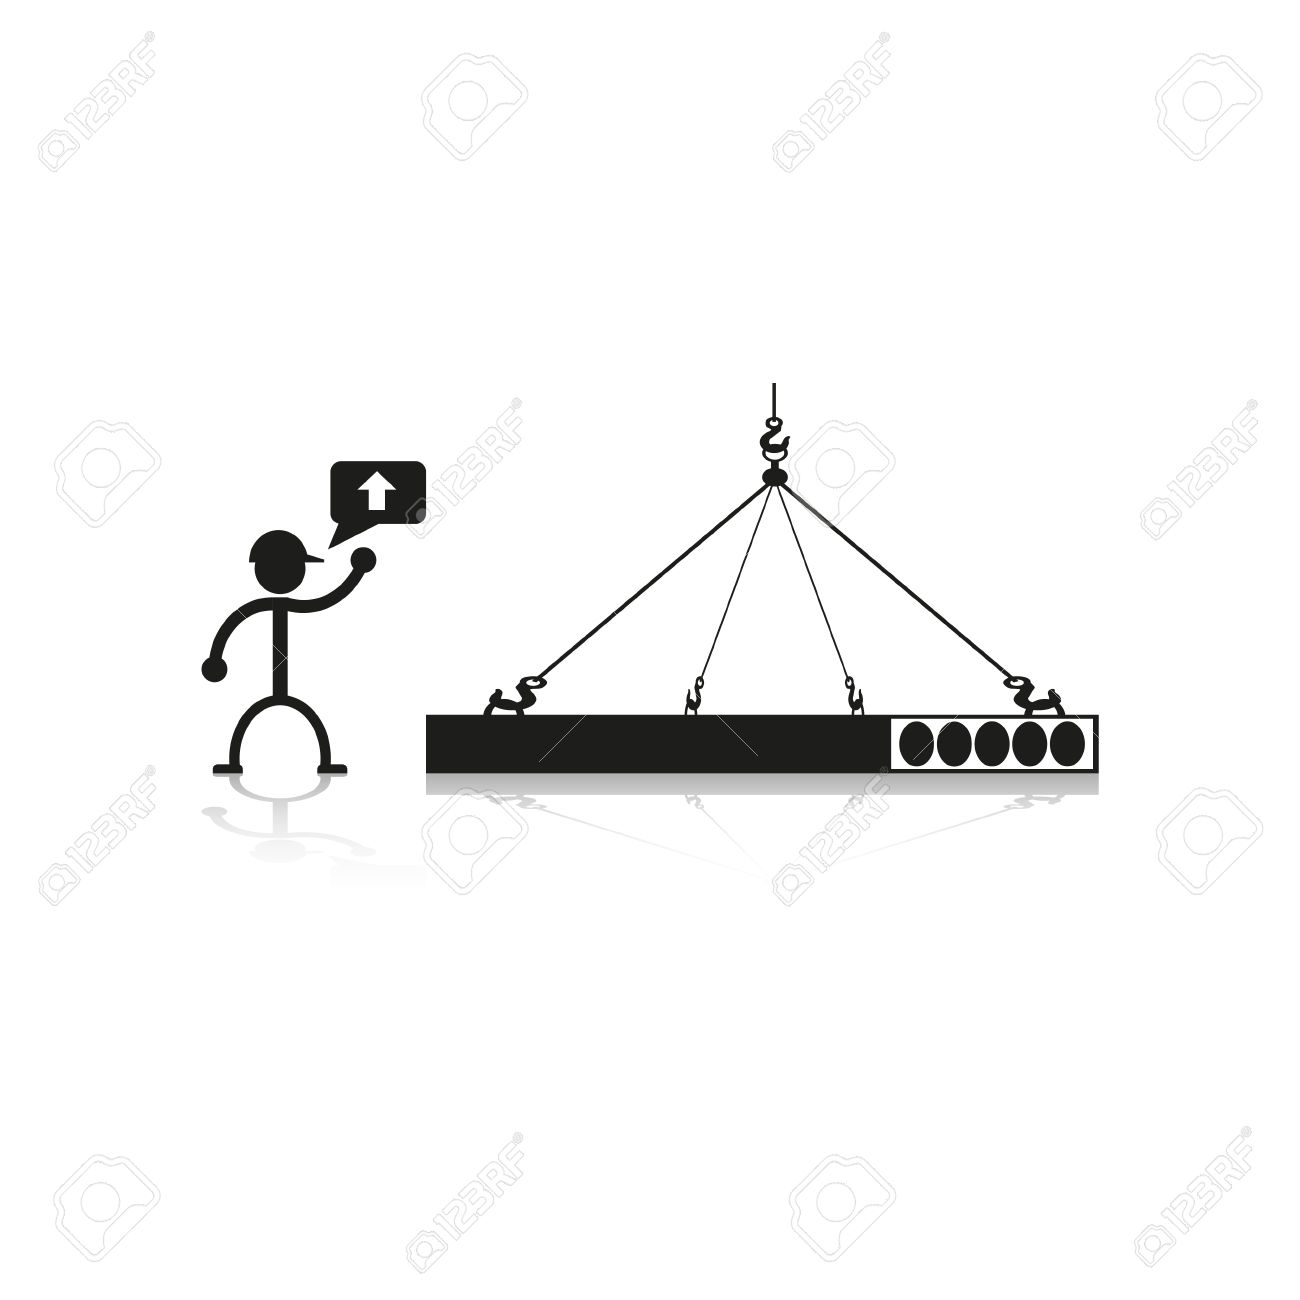 Loading Crane Construction Slabs. Vector Illustration. Royalty.